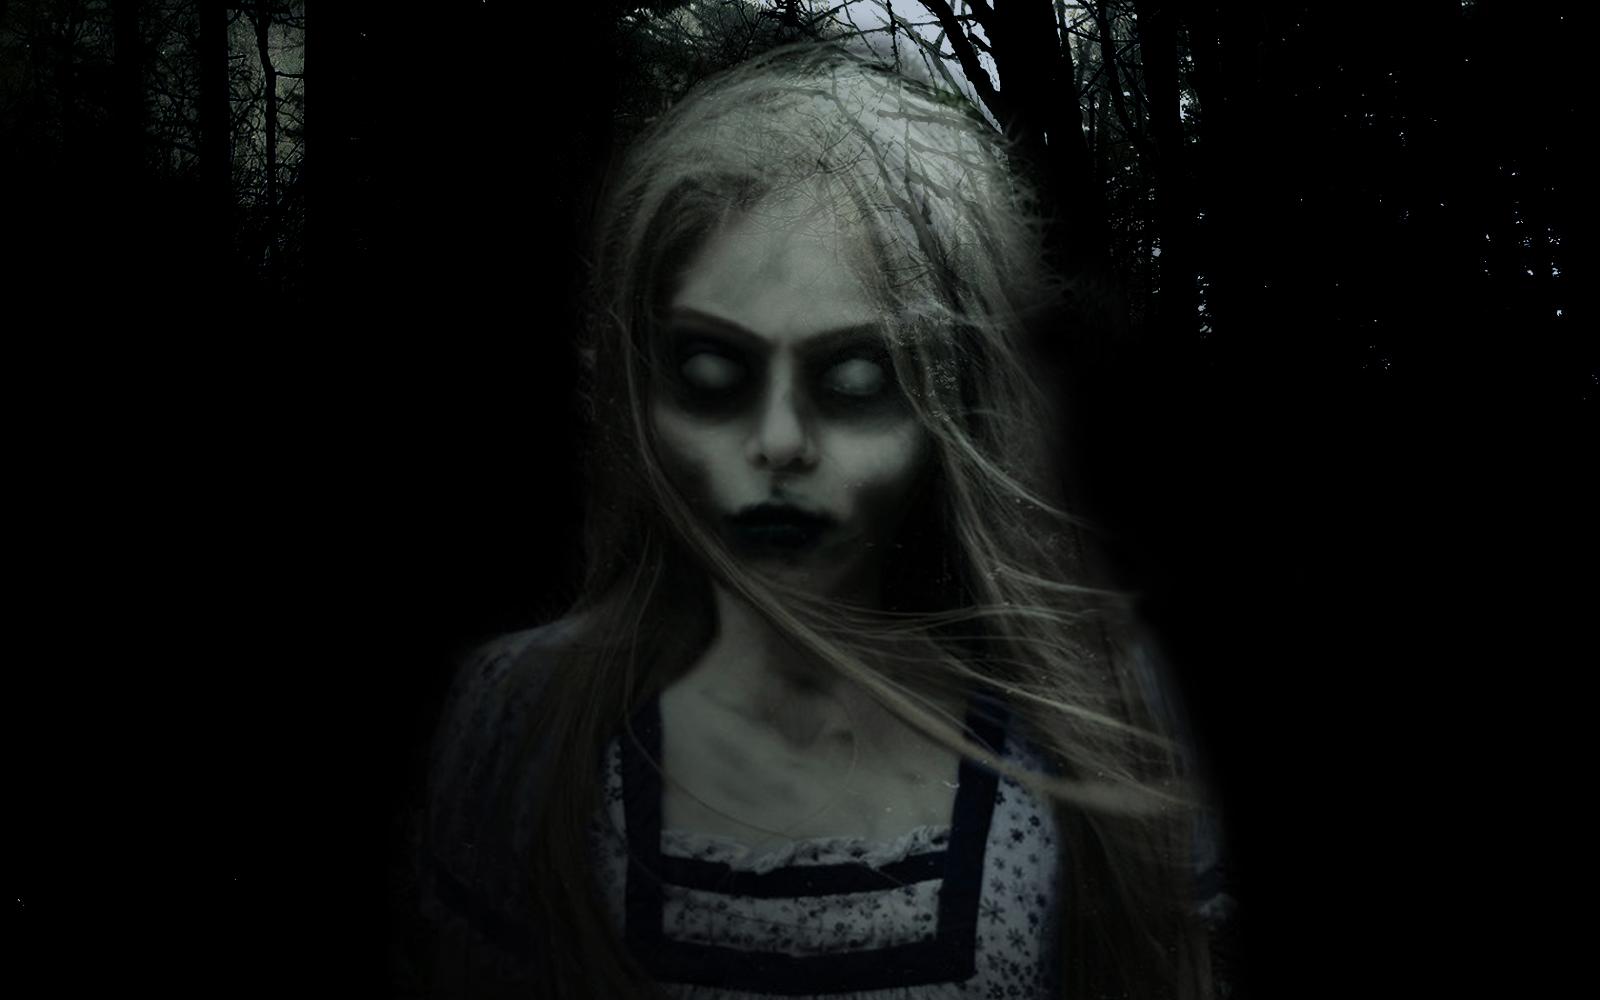 leyenda de la joven asesinada1